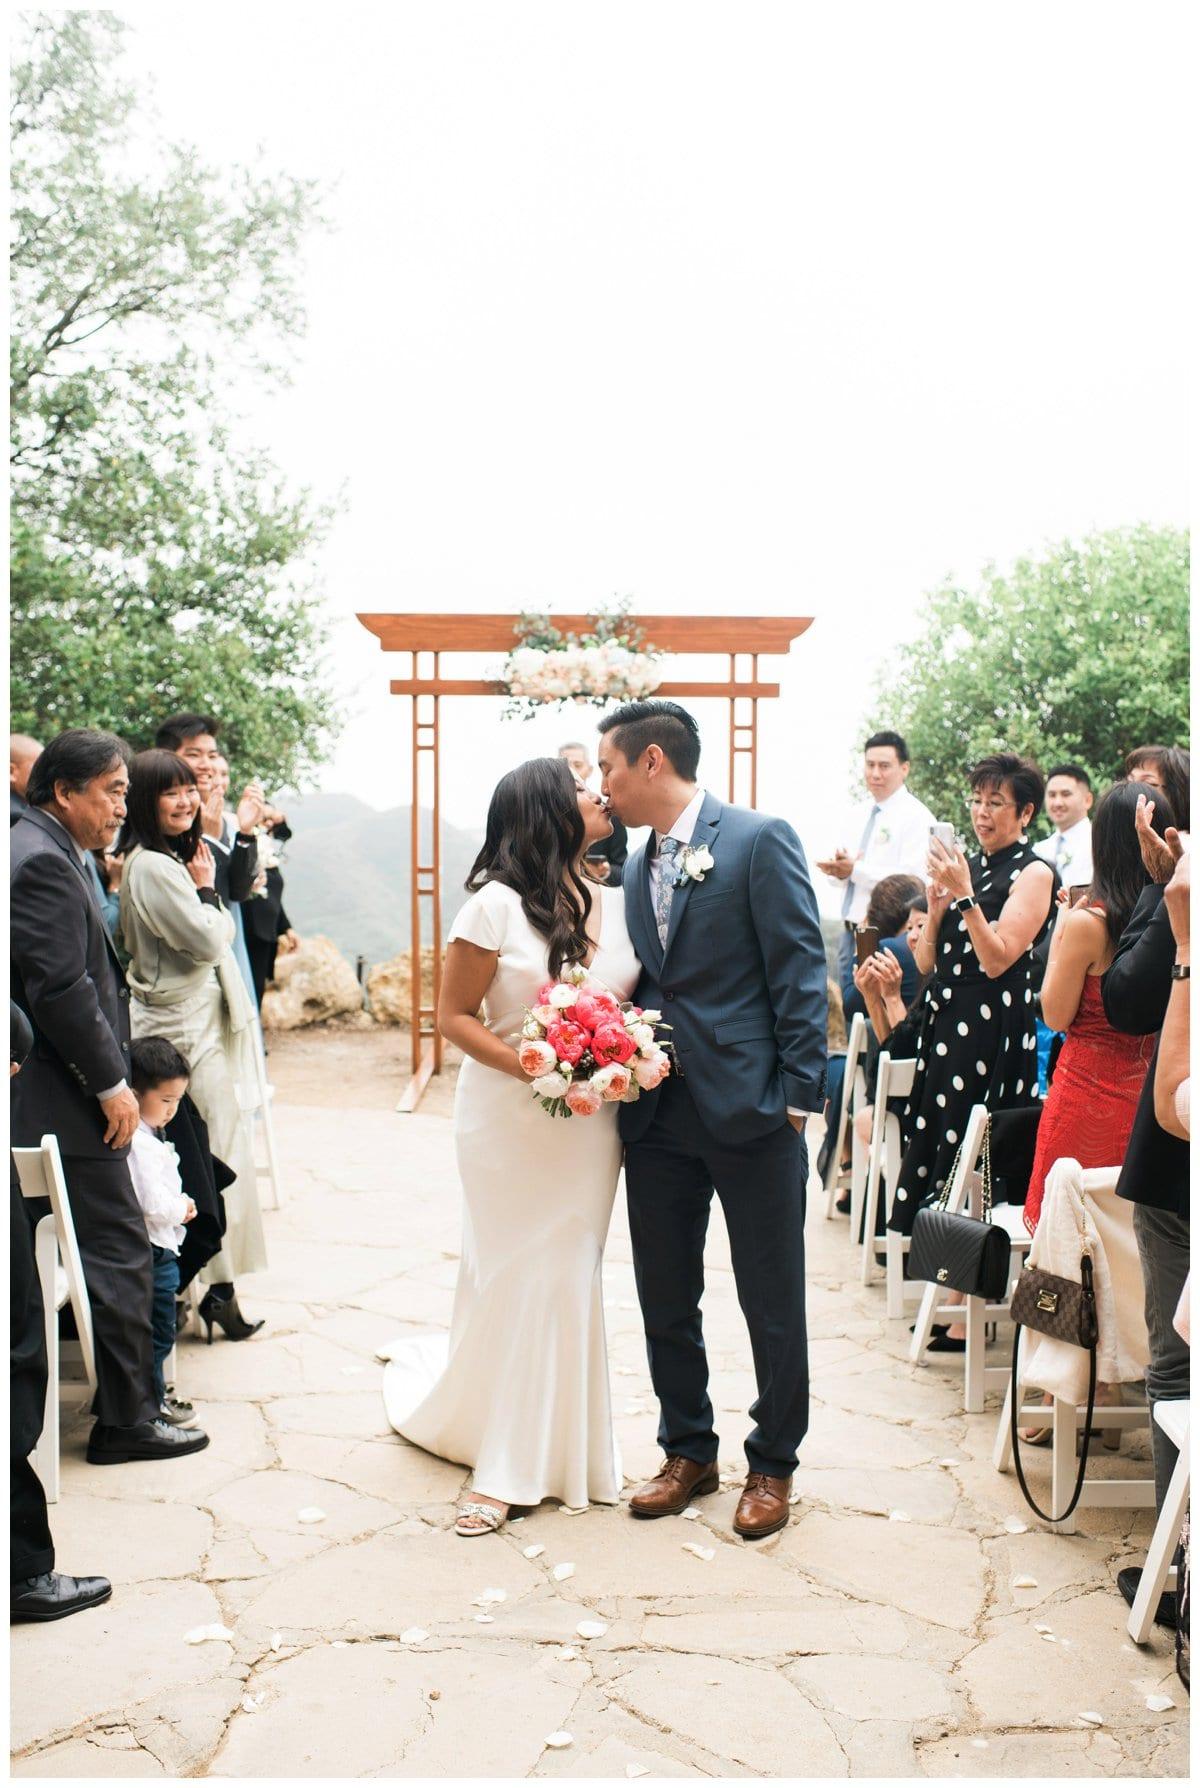 Malibu-Solstice-Vinyard-Wedding-Carissa-Woo-Photography_0080.jpg